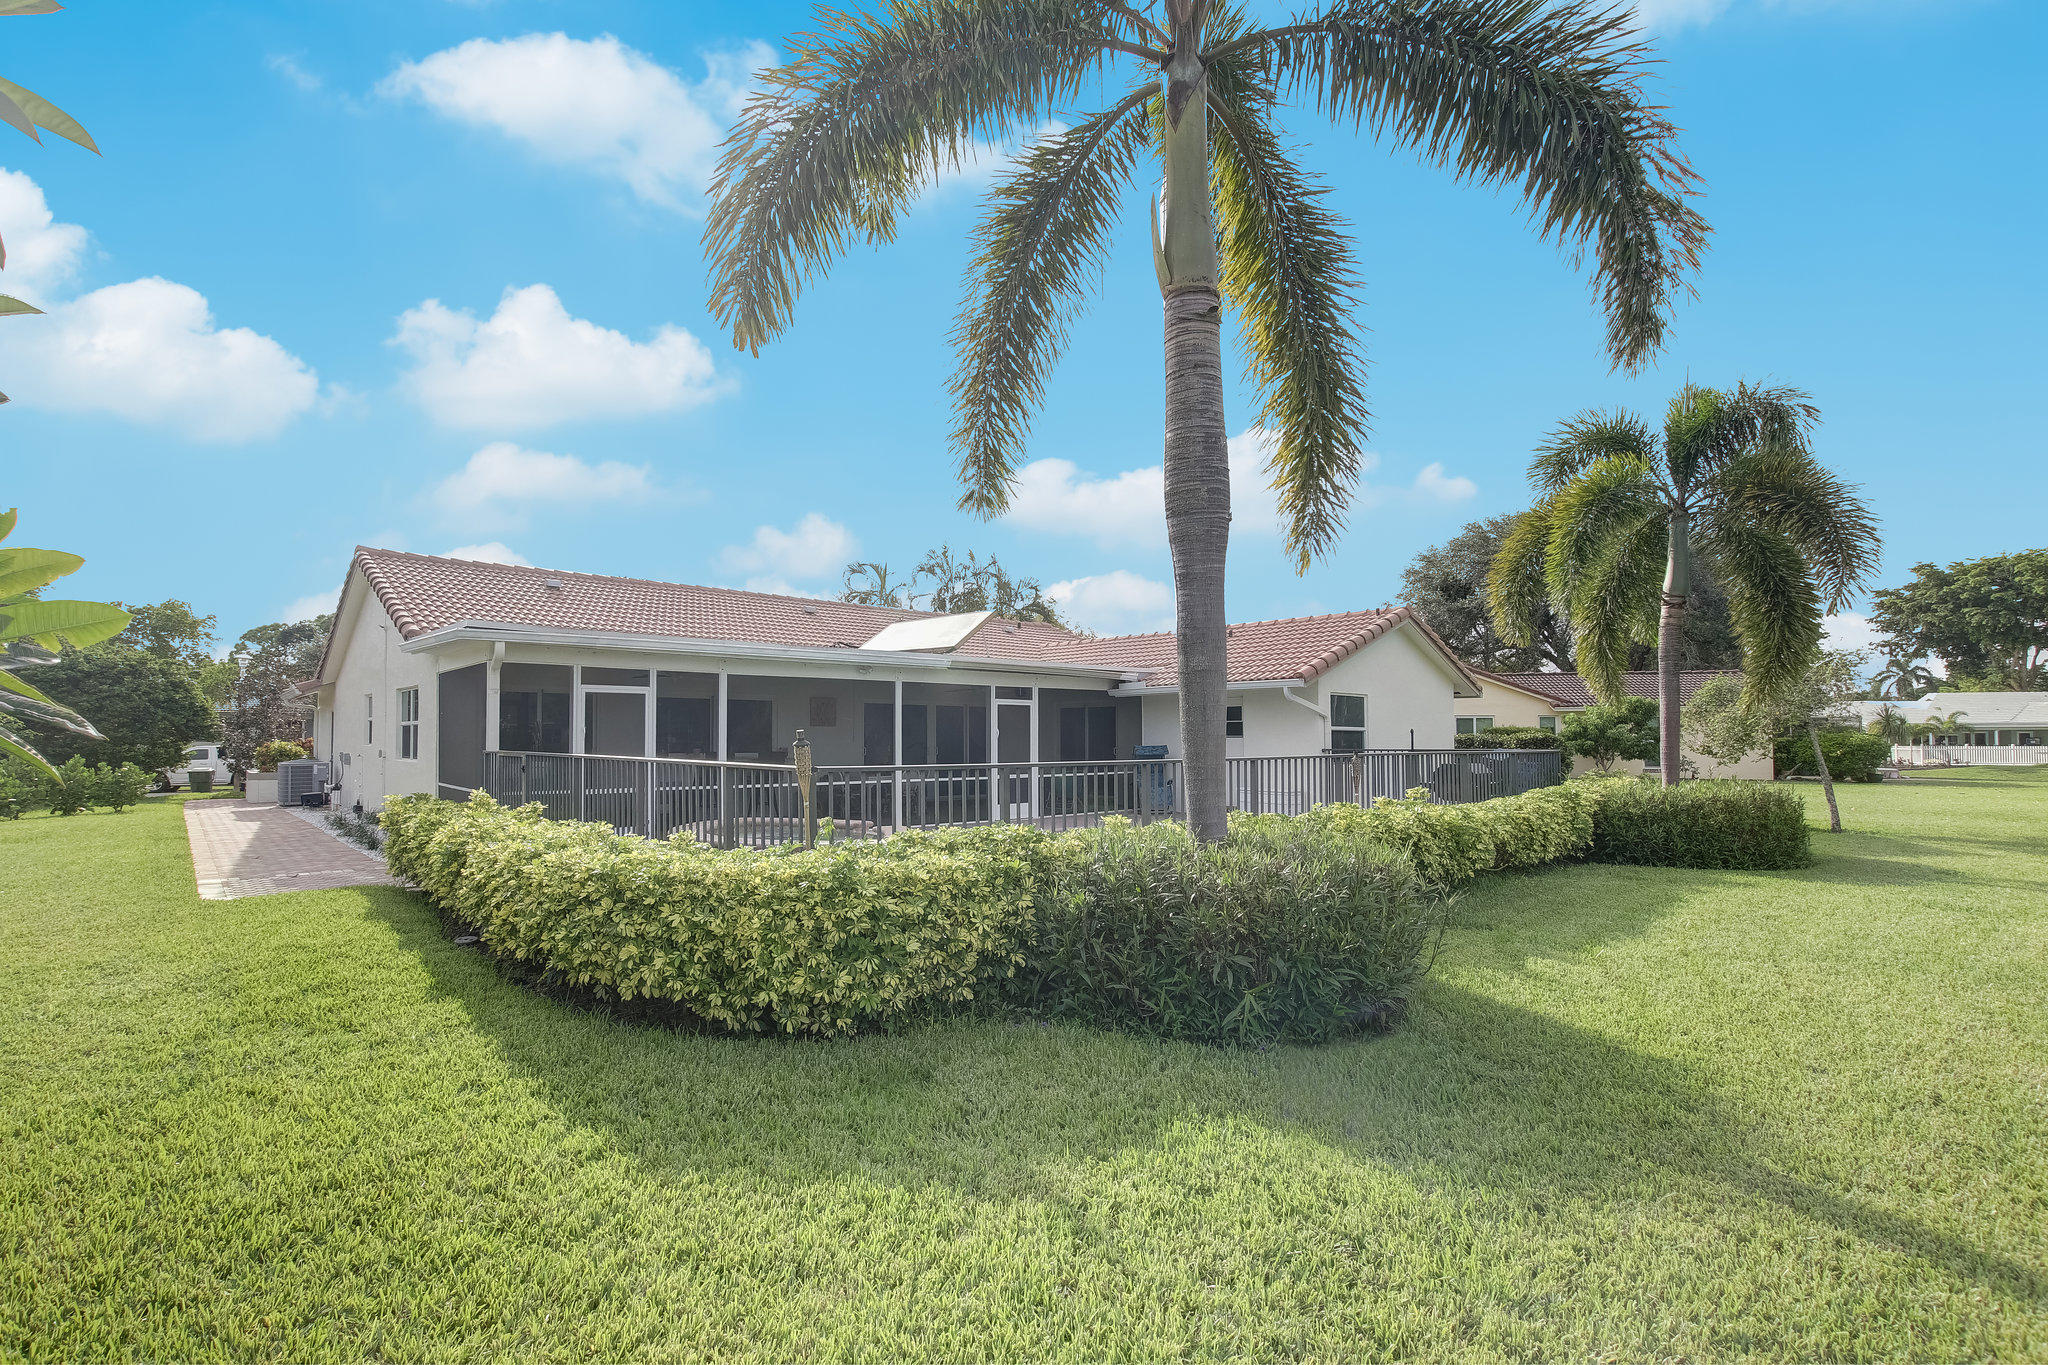 2900 Nw 23rd Court Boca Raton, FL 33431